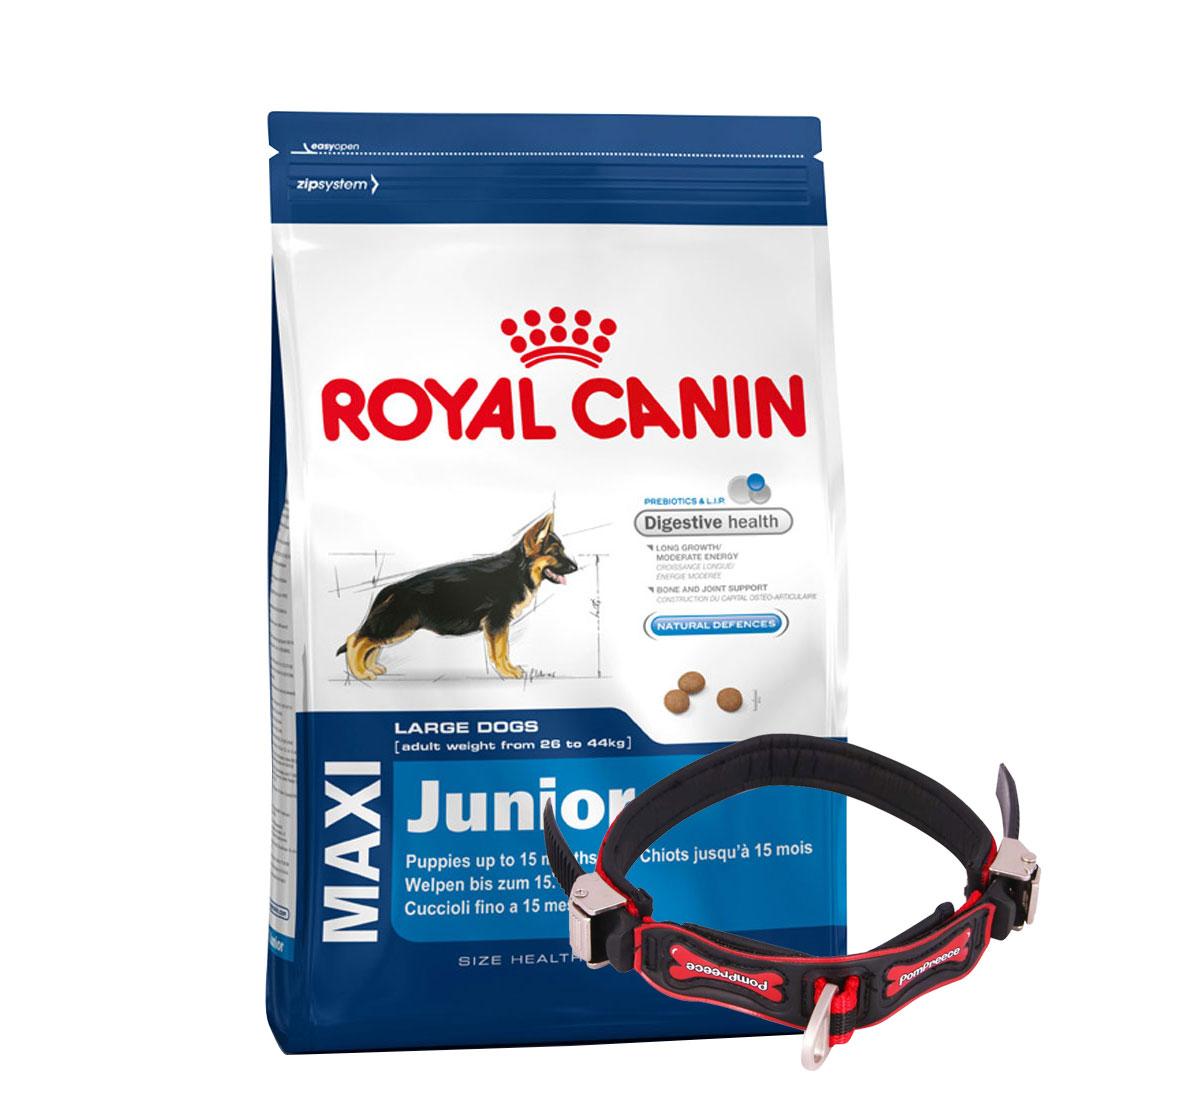 Royal Canin Maxi Junior - 4 Kg With Ergocomfort Dog Collar Small-Red